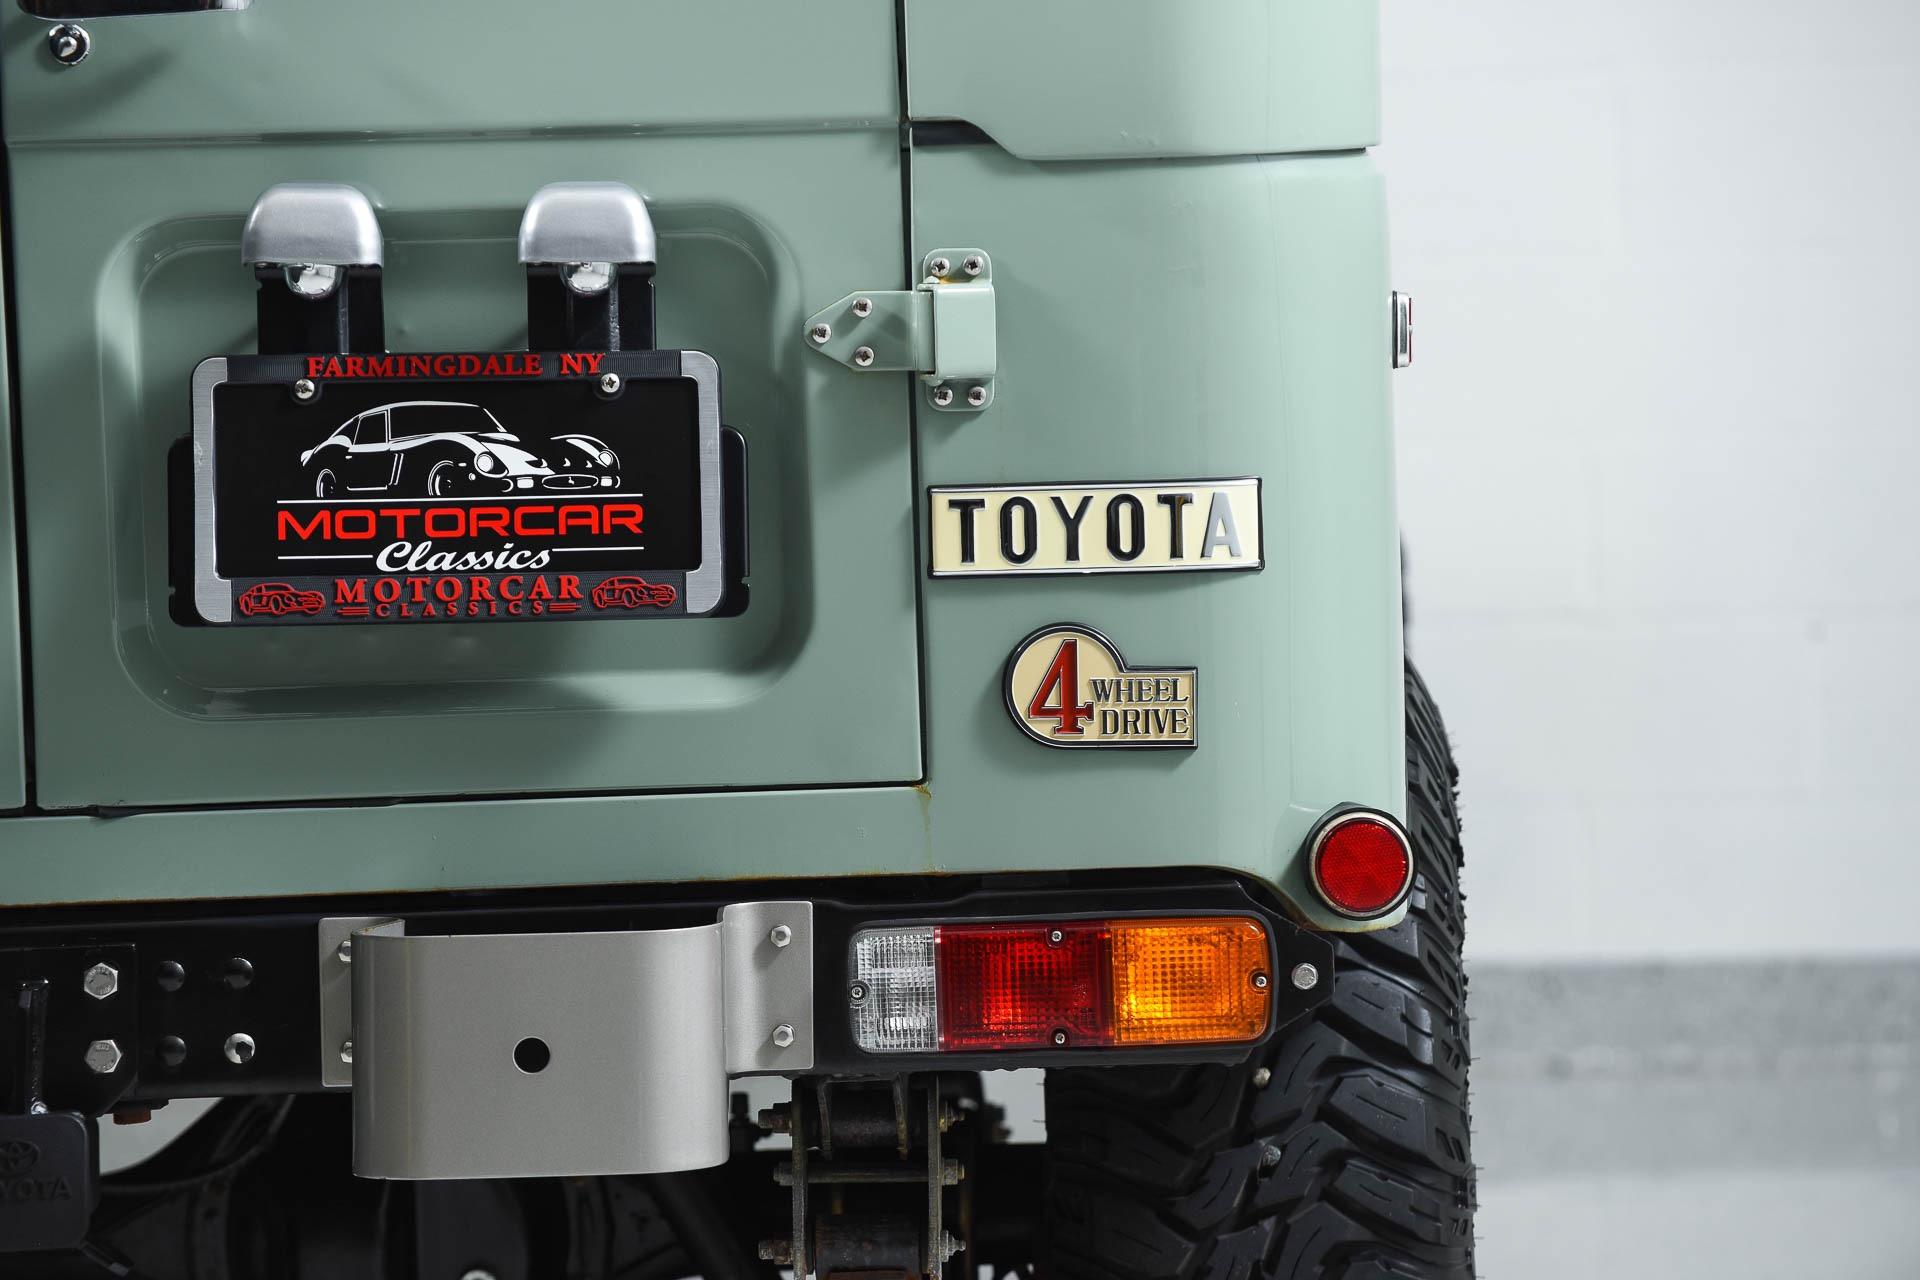 1977 Toyota Land Cruiser FJ40